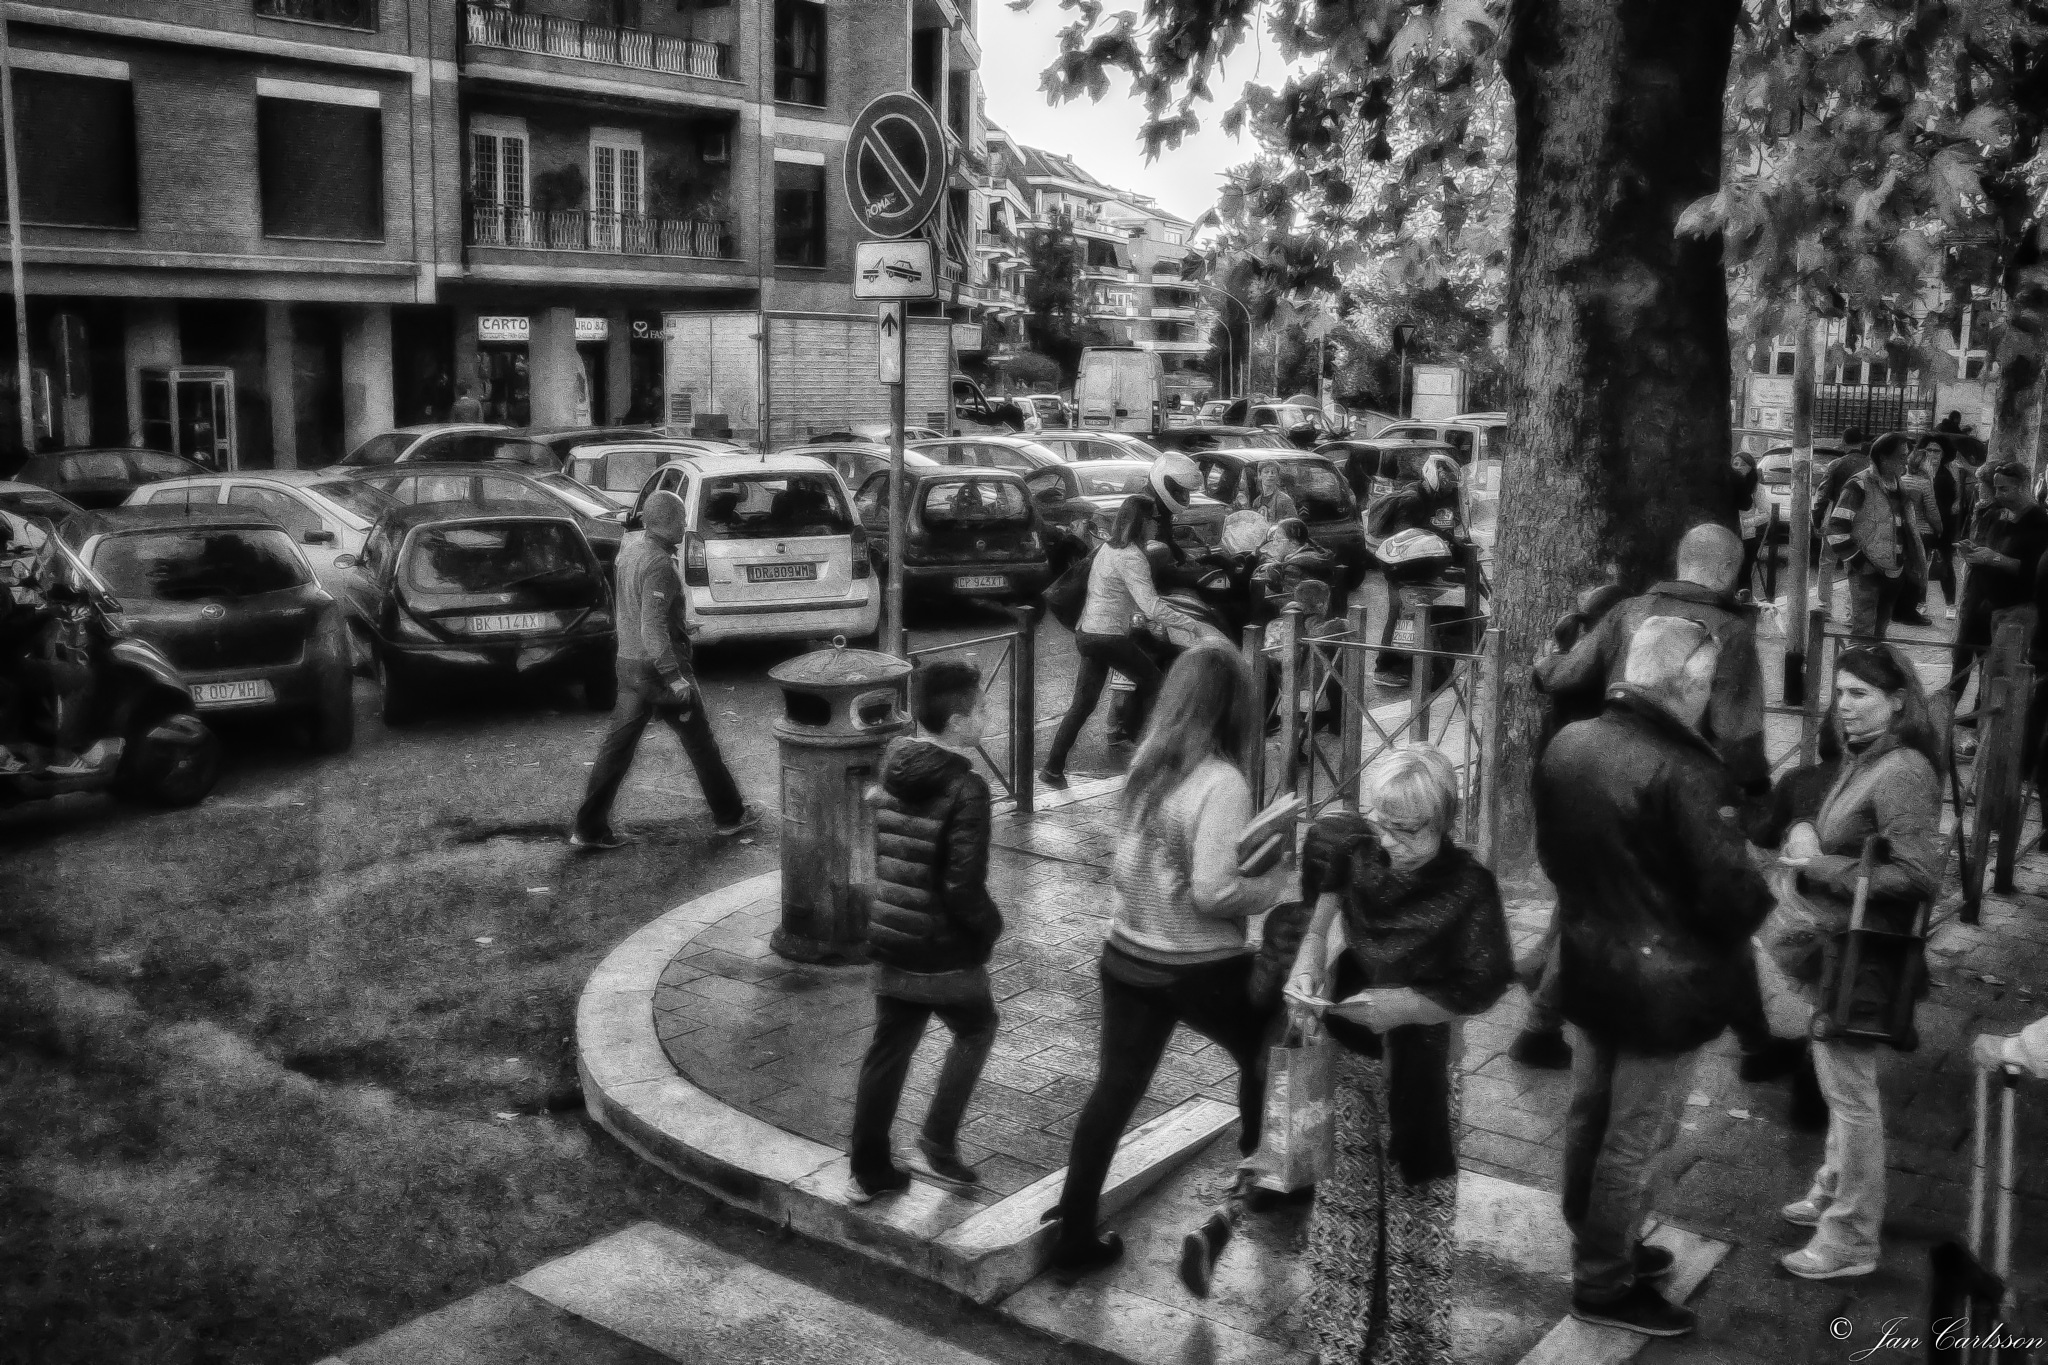 Early Morning in Rome by carljan w carlsson